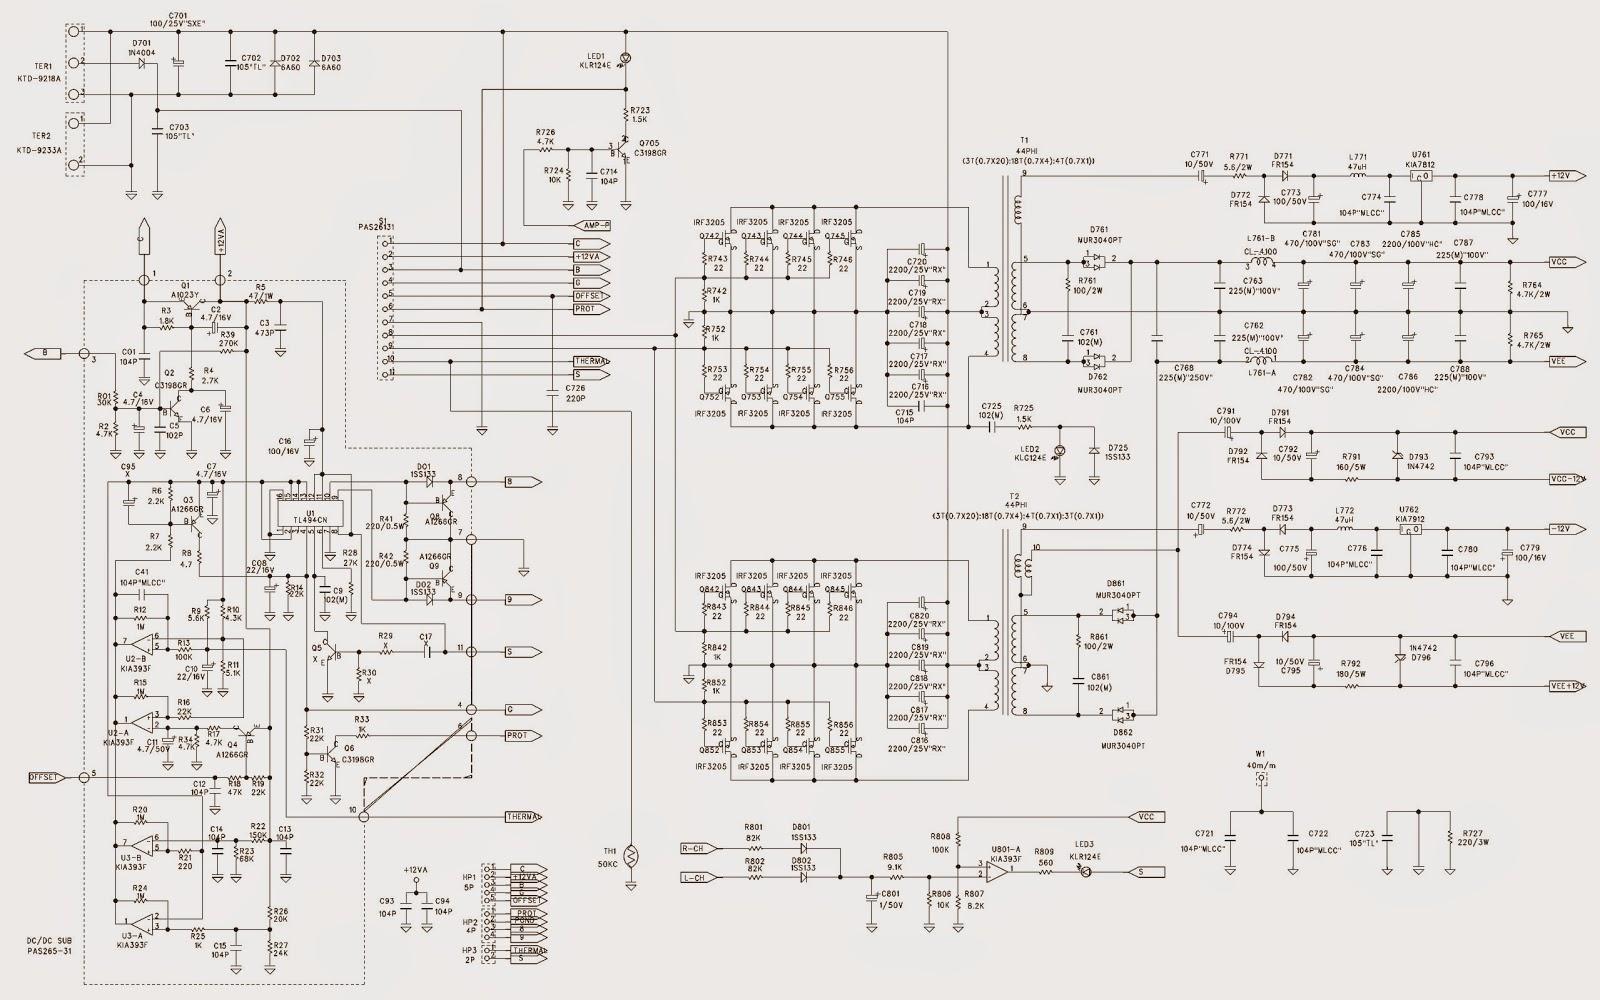 2 channel car amp wiring diagram 3 wire stop start jbl bpx2200 1 power amplifier